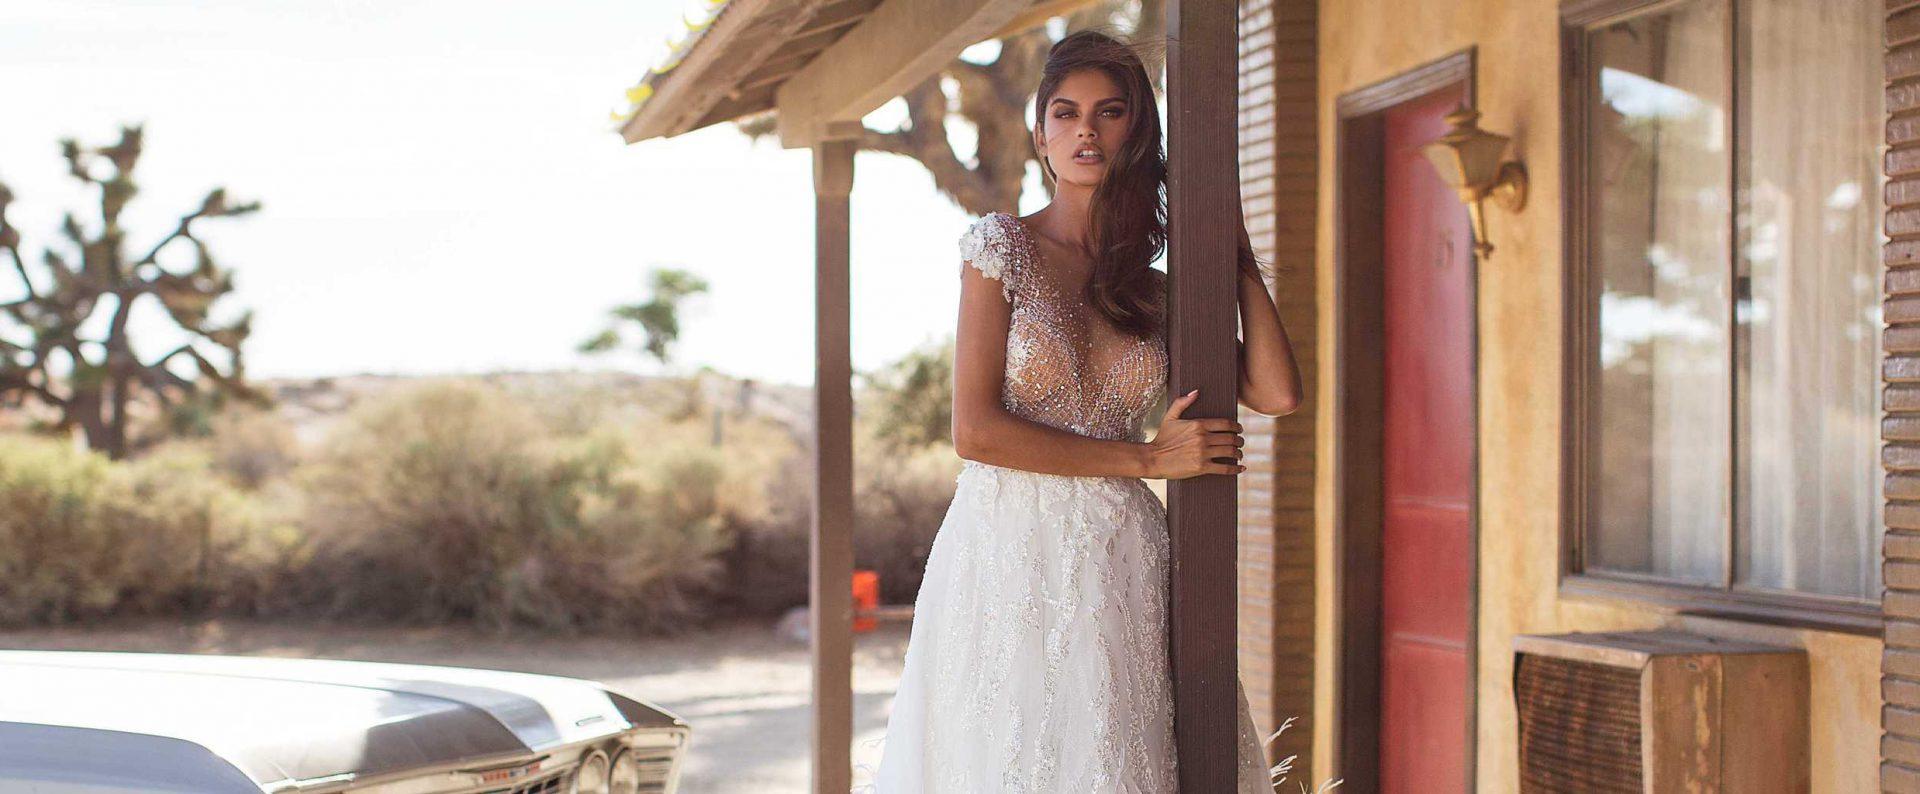 designer wedding dress milla nova paris france P